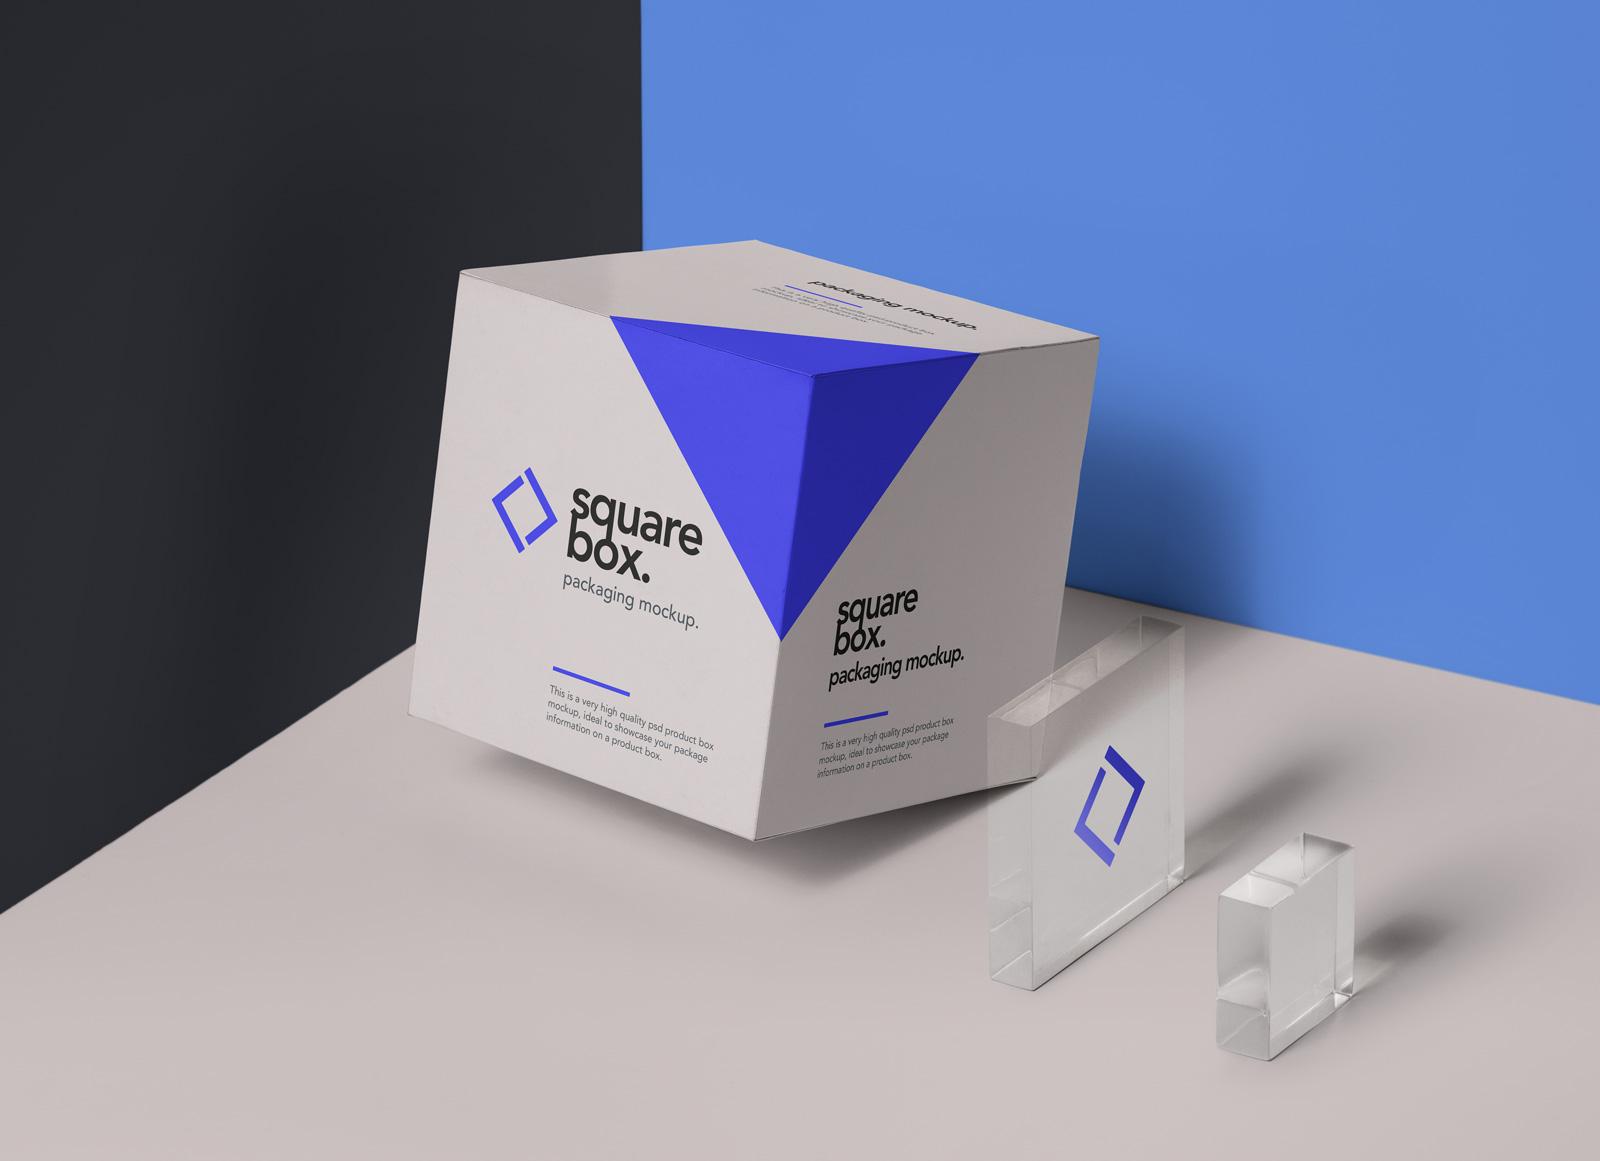 Free-Square-Box-Packaging-Mockup-PSD